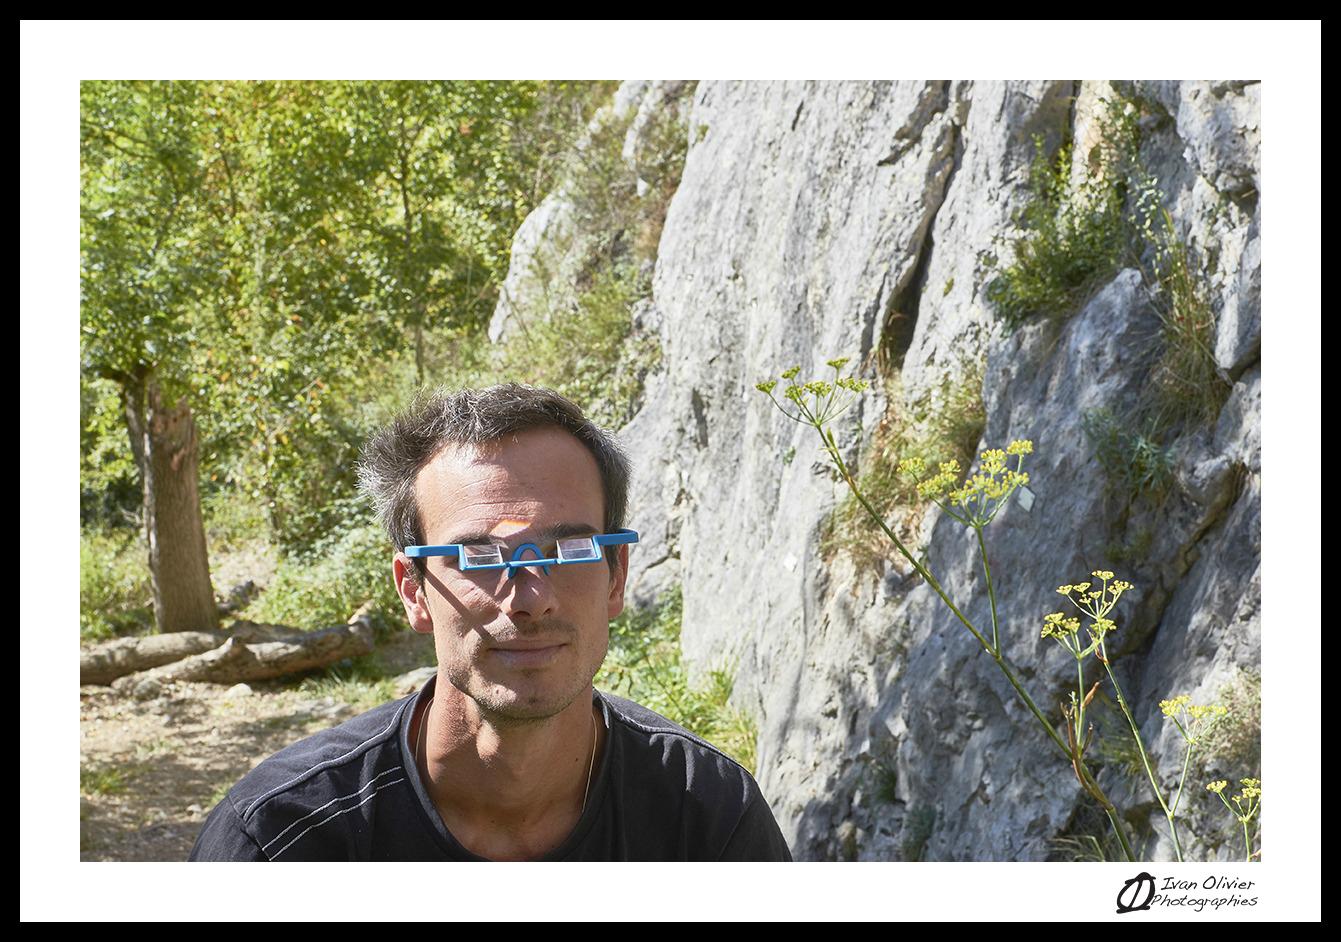 france-lunettes-yy-ivan-olivier-photographie-23